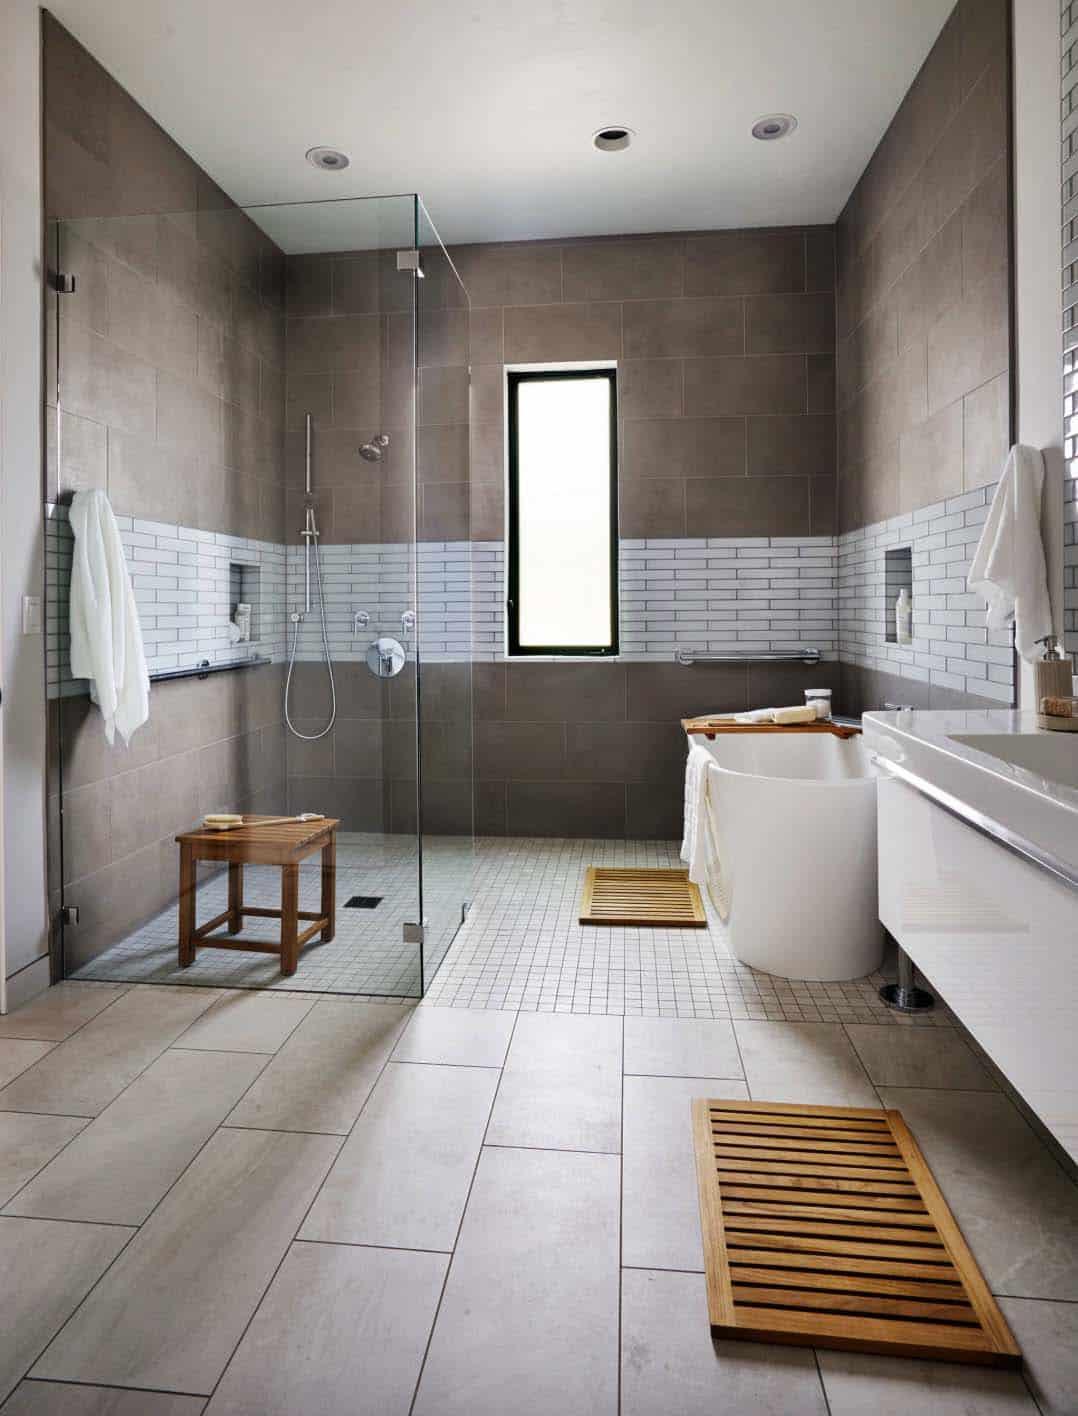 salle-de-bain-maison-contemporaine-radiante